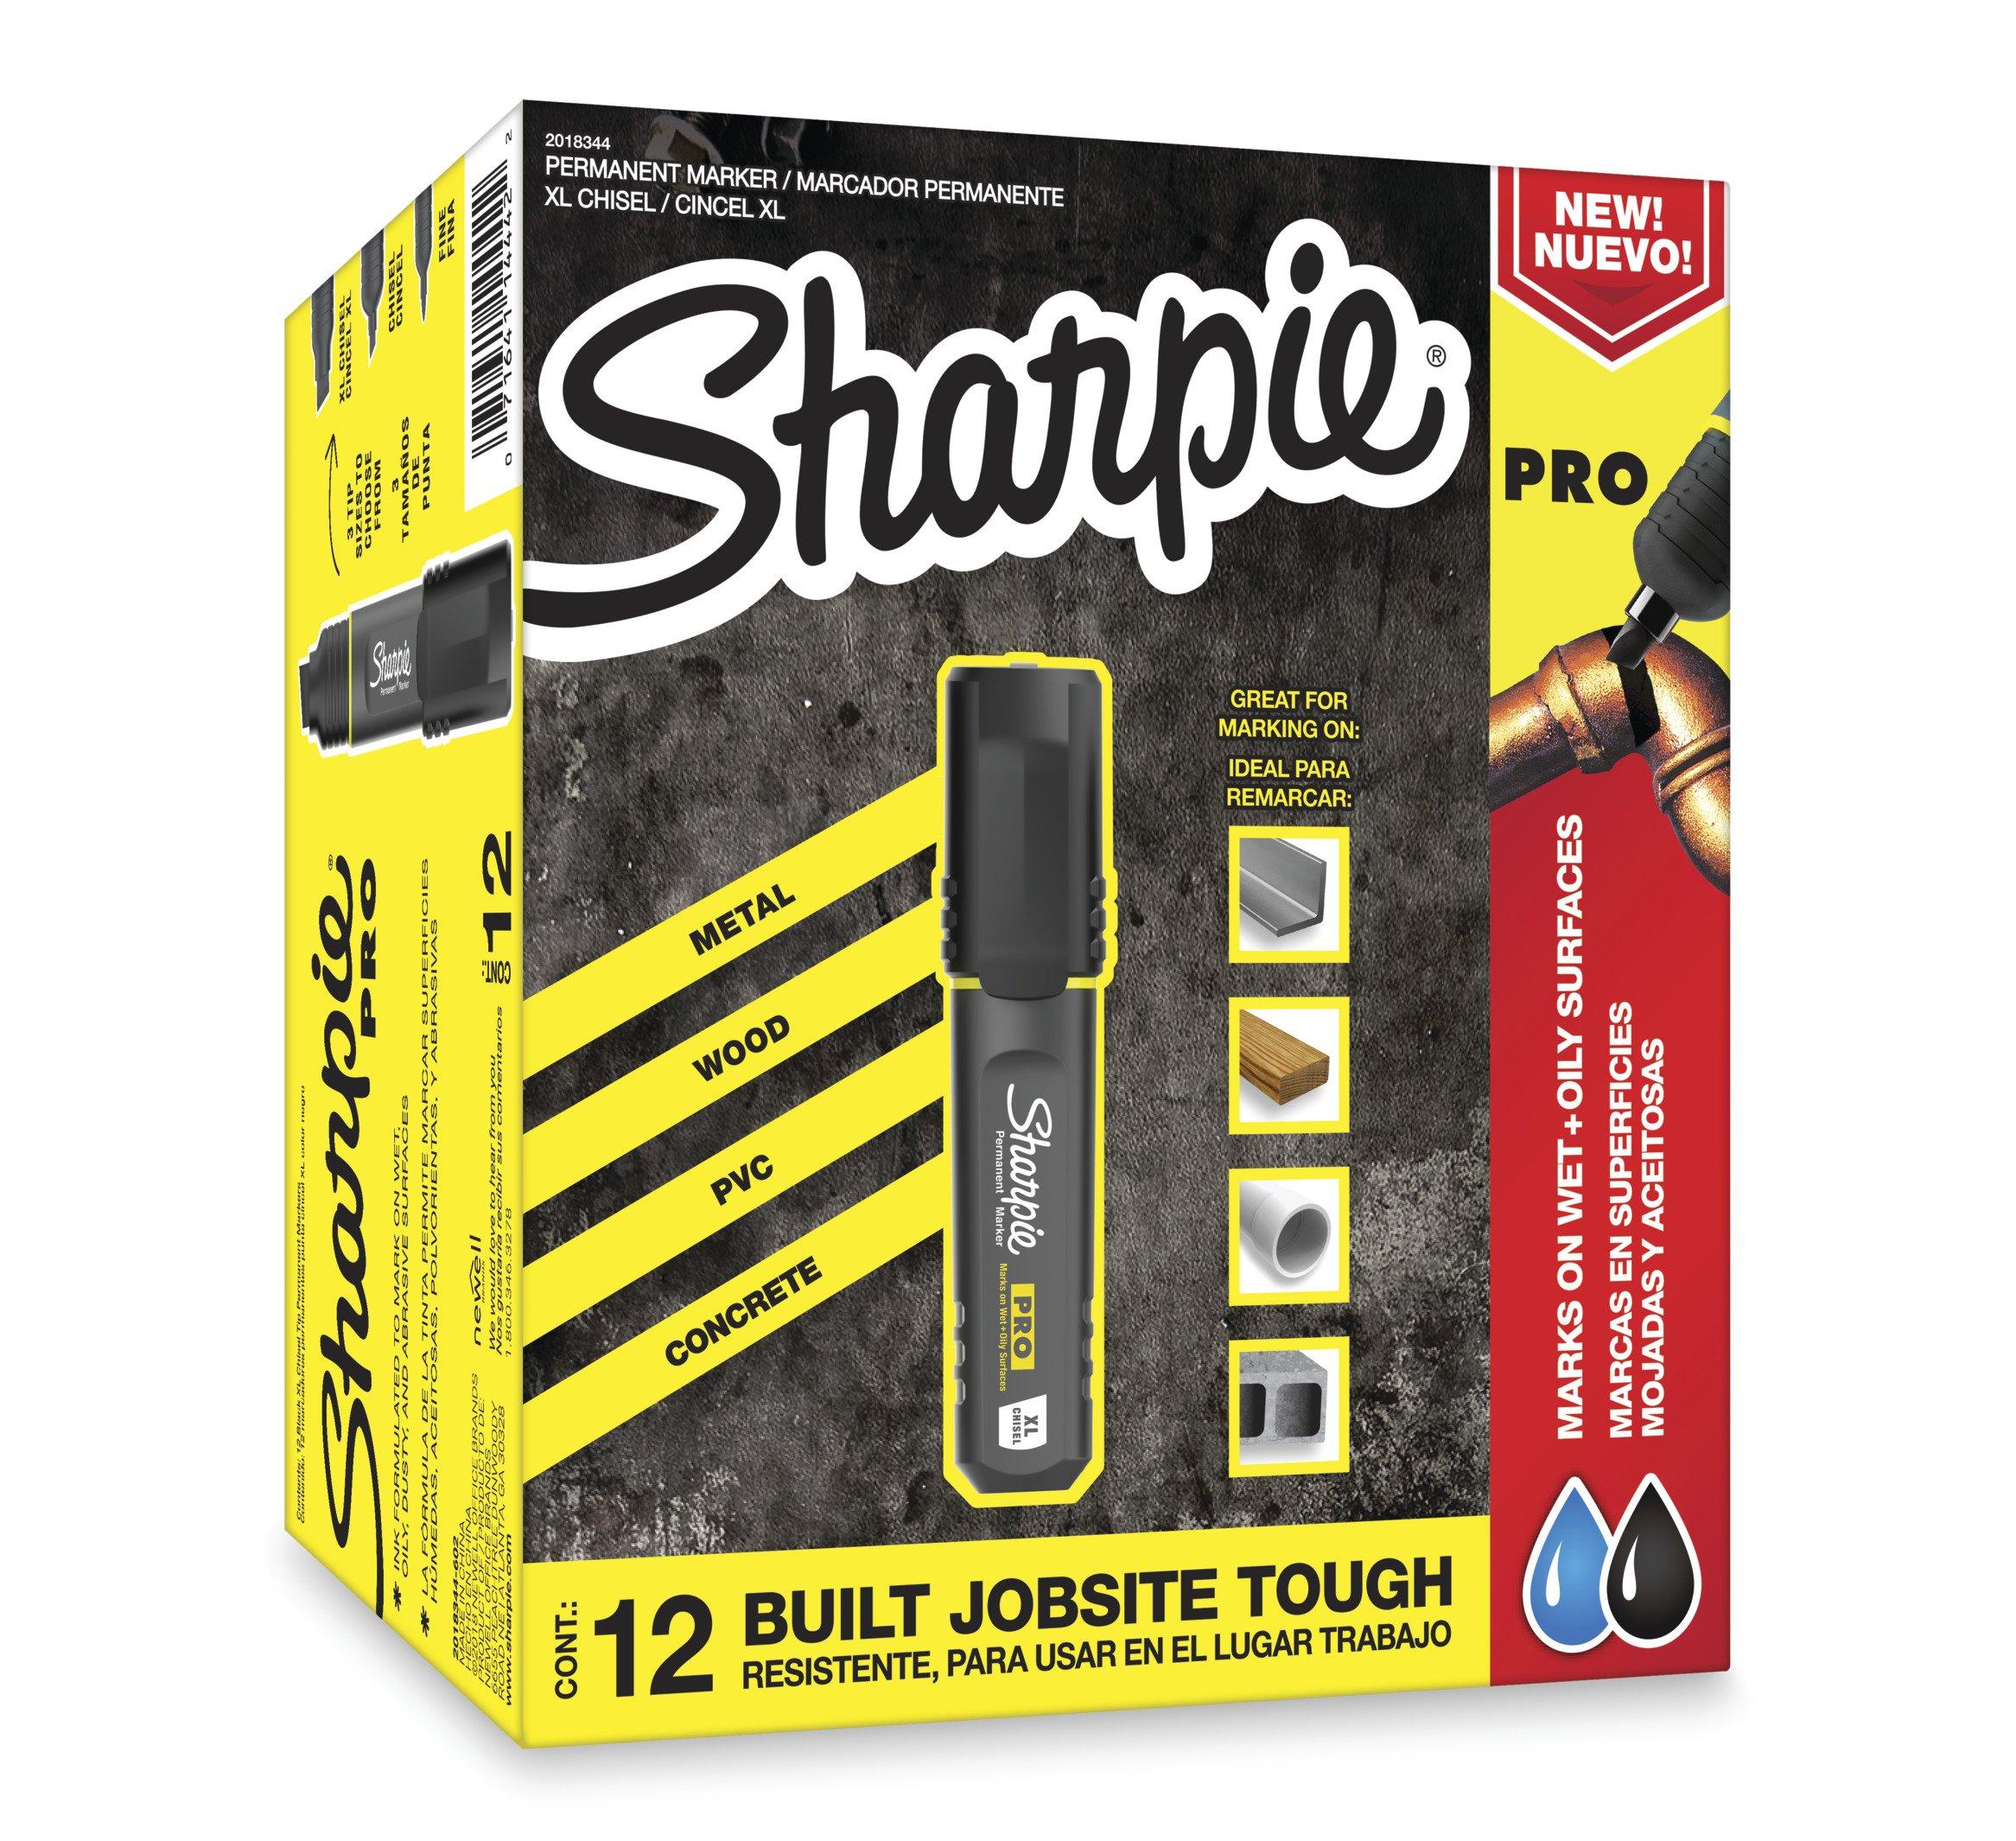 Sharpie Pro Permanent Marker, Medium, Chisel Tip, Black, 12-Count Marker (2018326) by SHARPIE